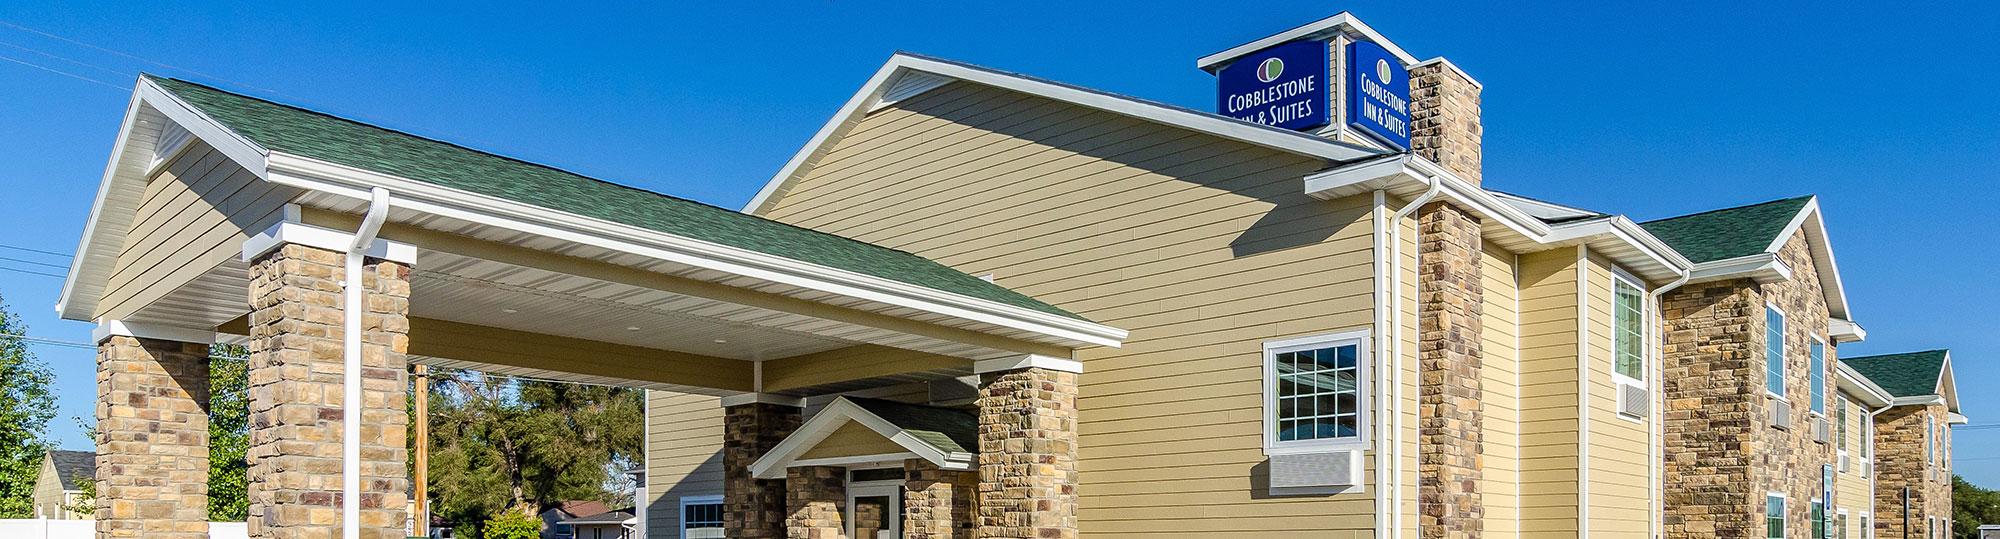 Cobblestone Inn and Suites Pine Bluffs